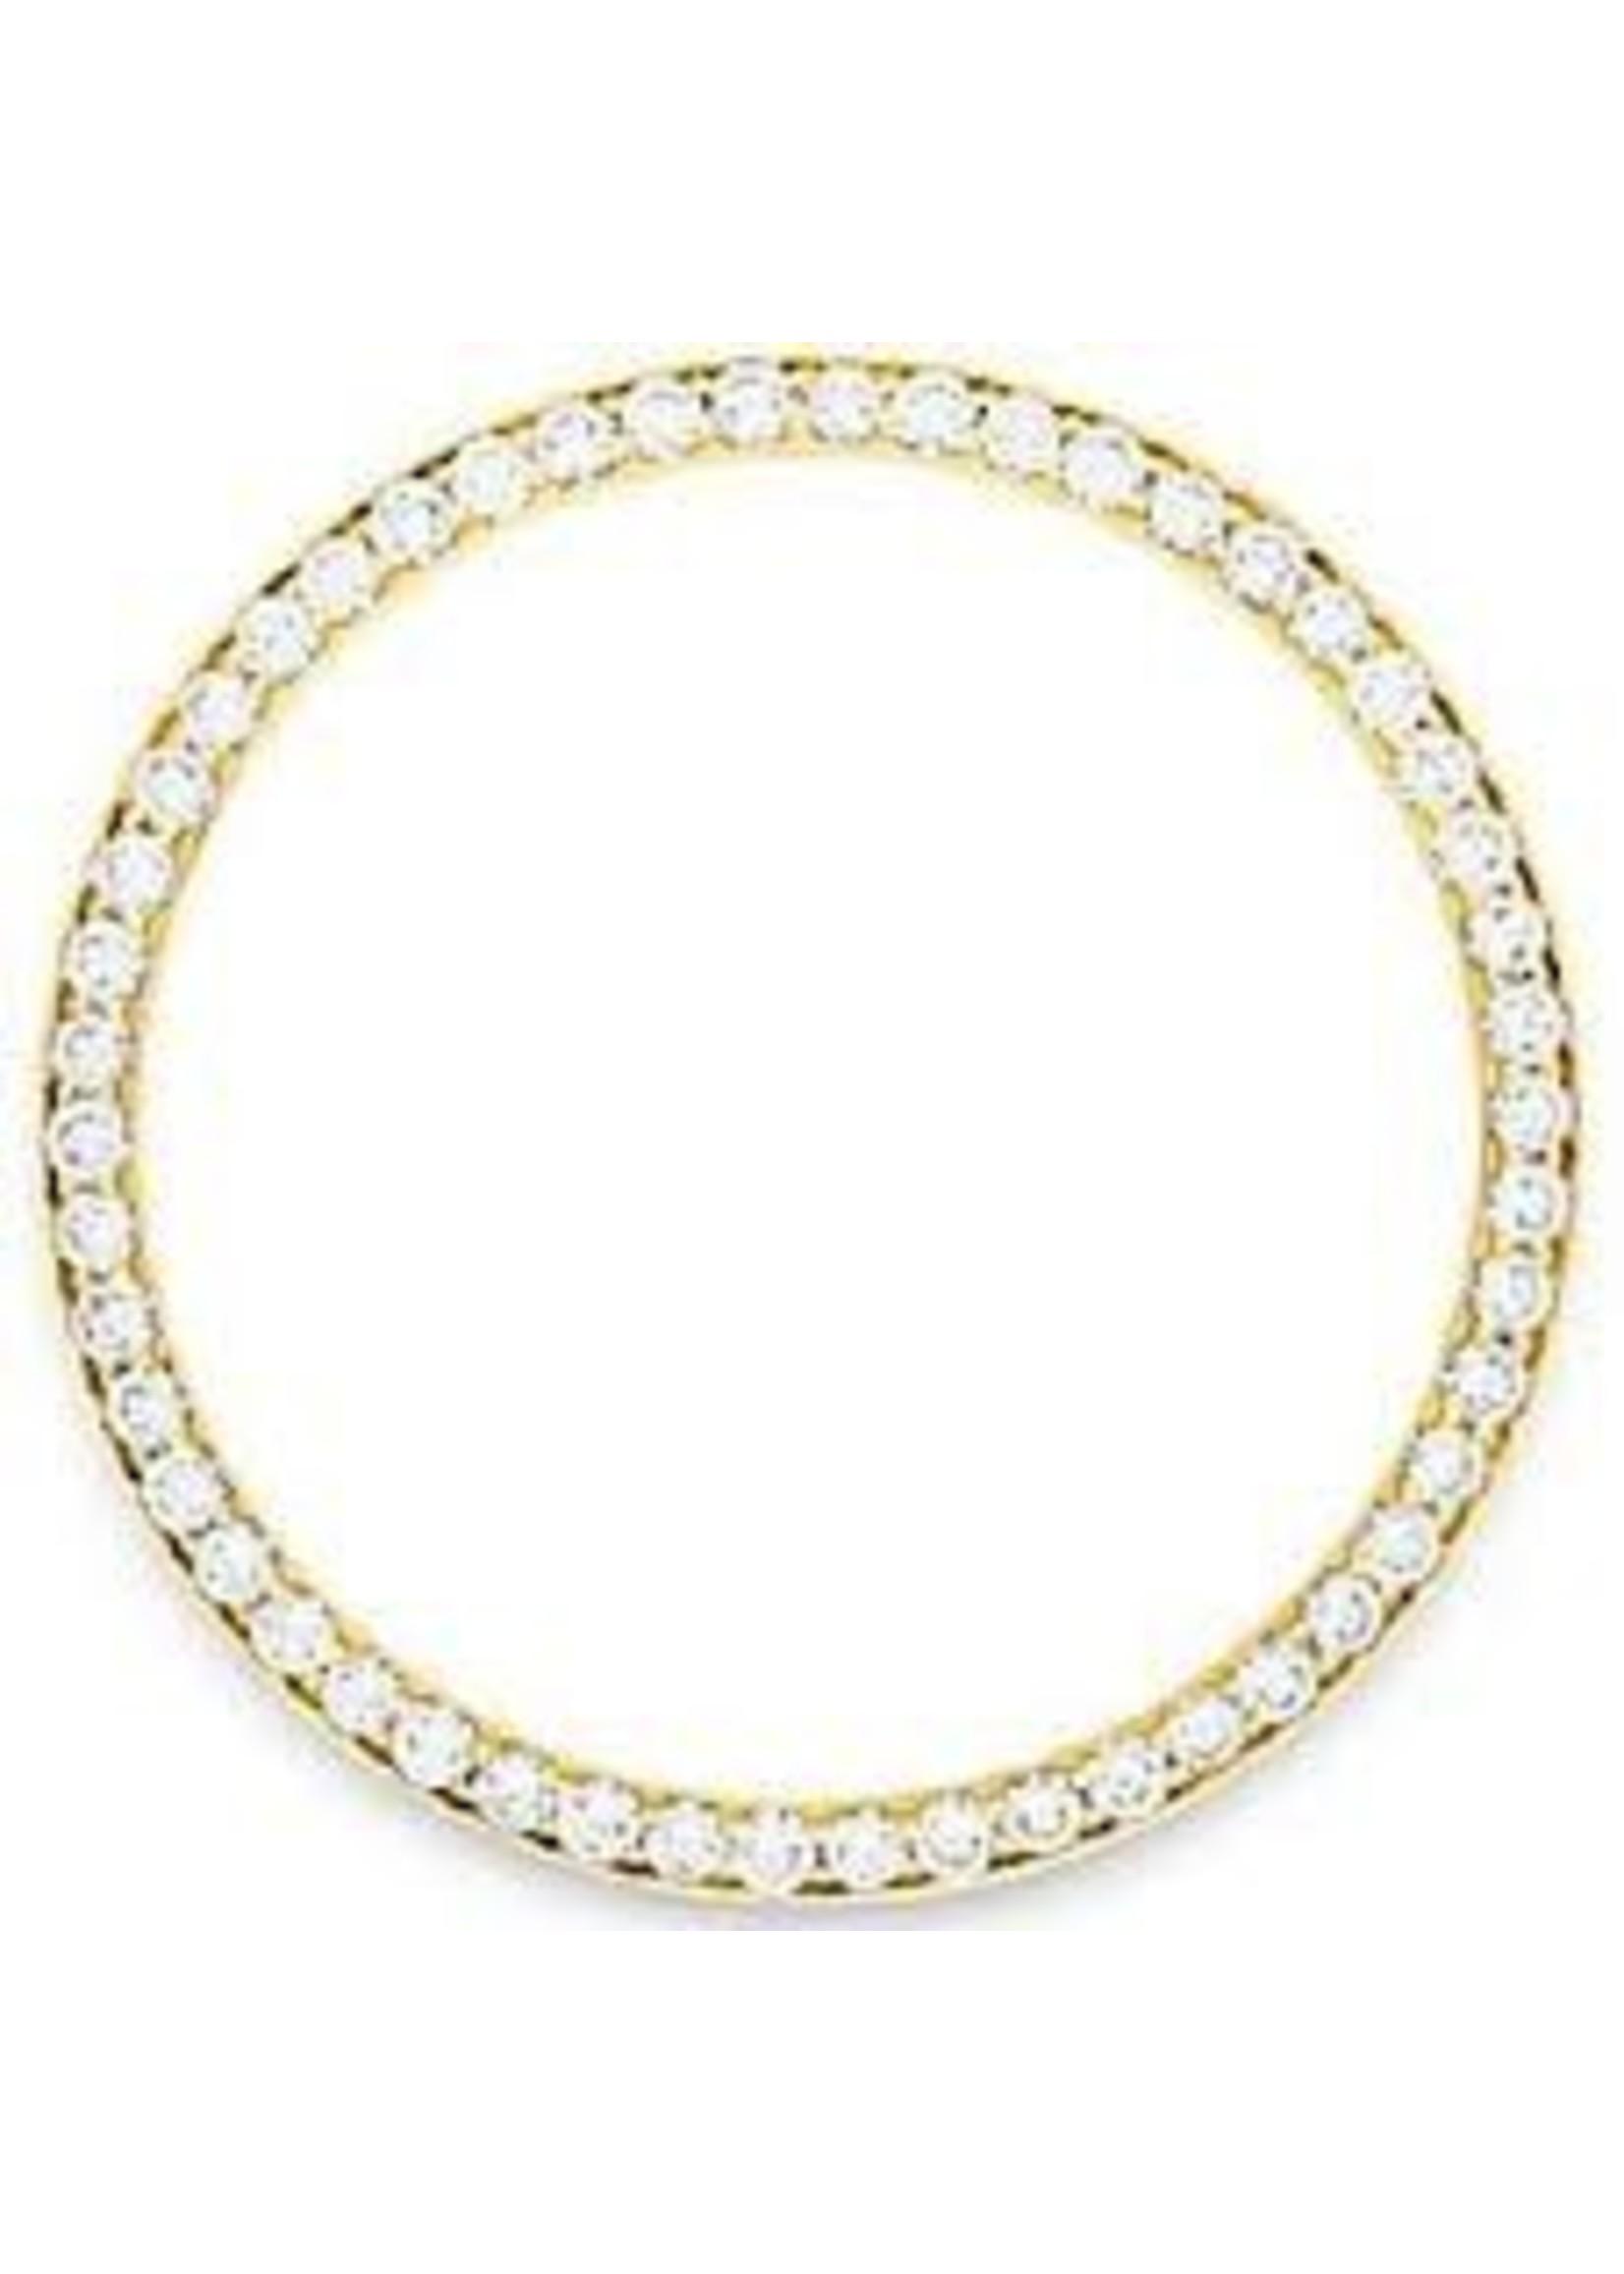 DIAMOND BEZEL ON YELLOW GOLD